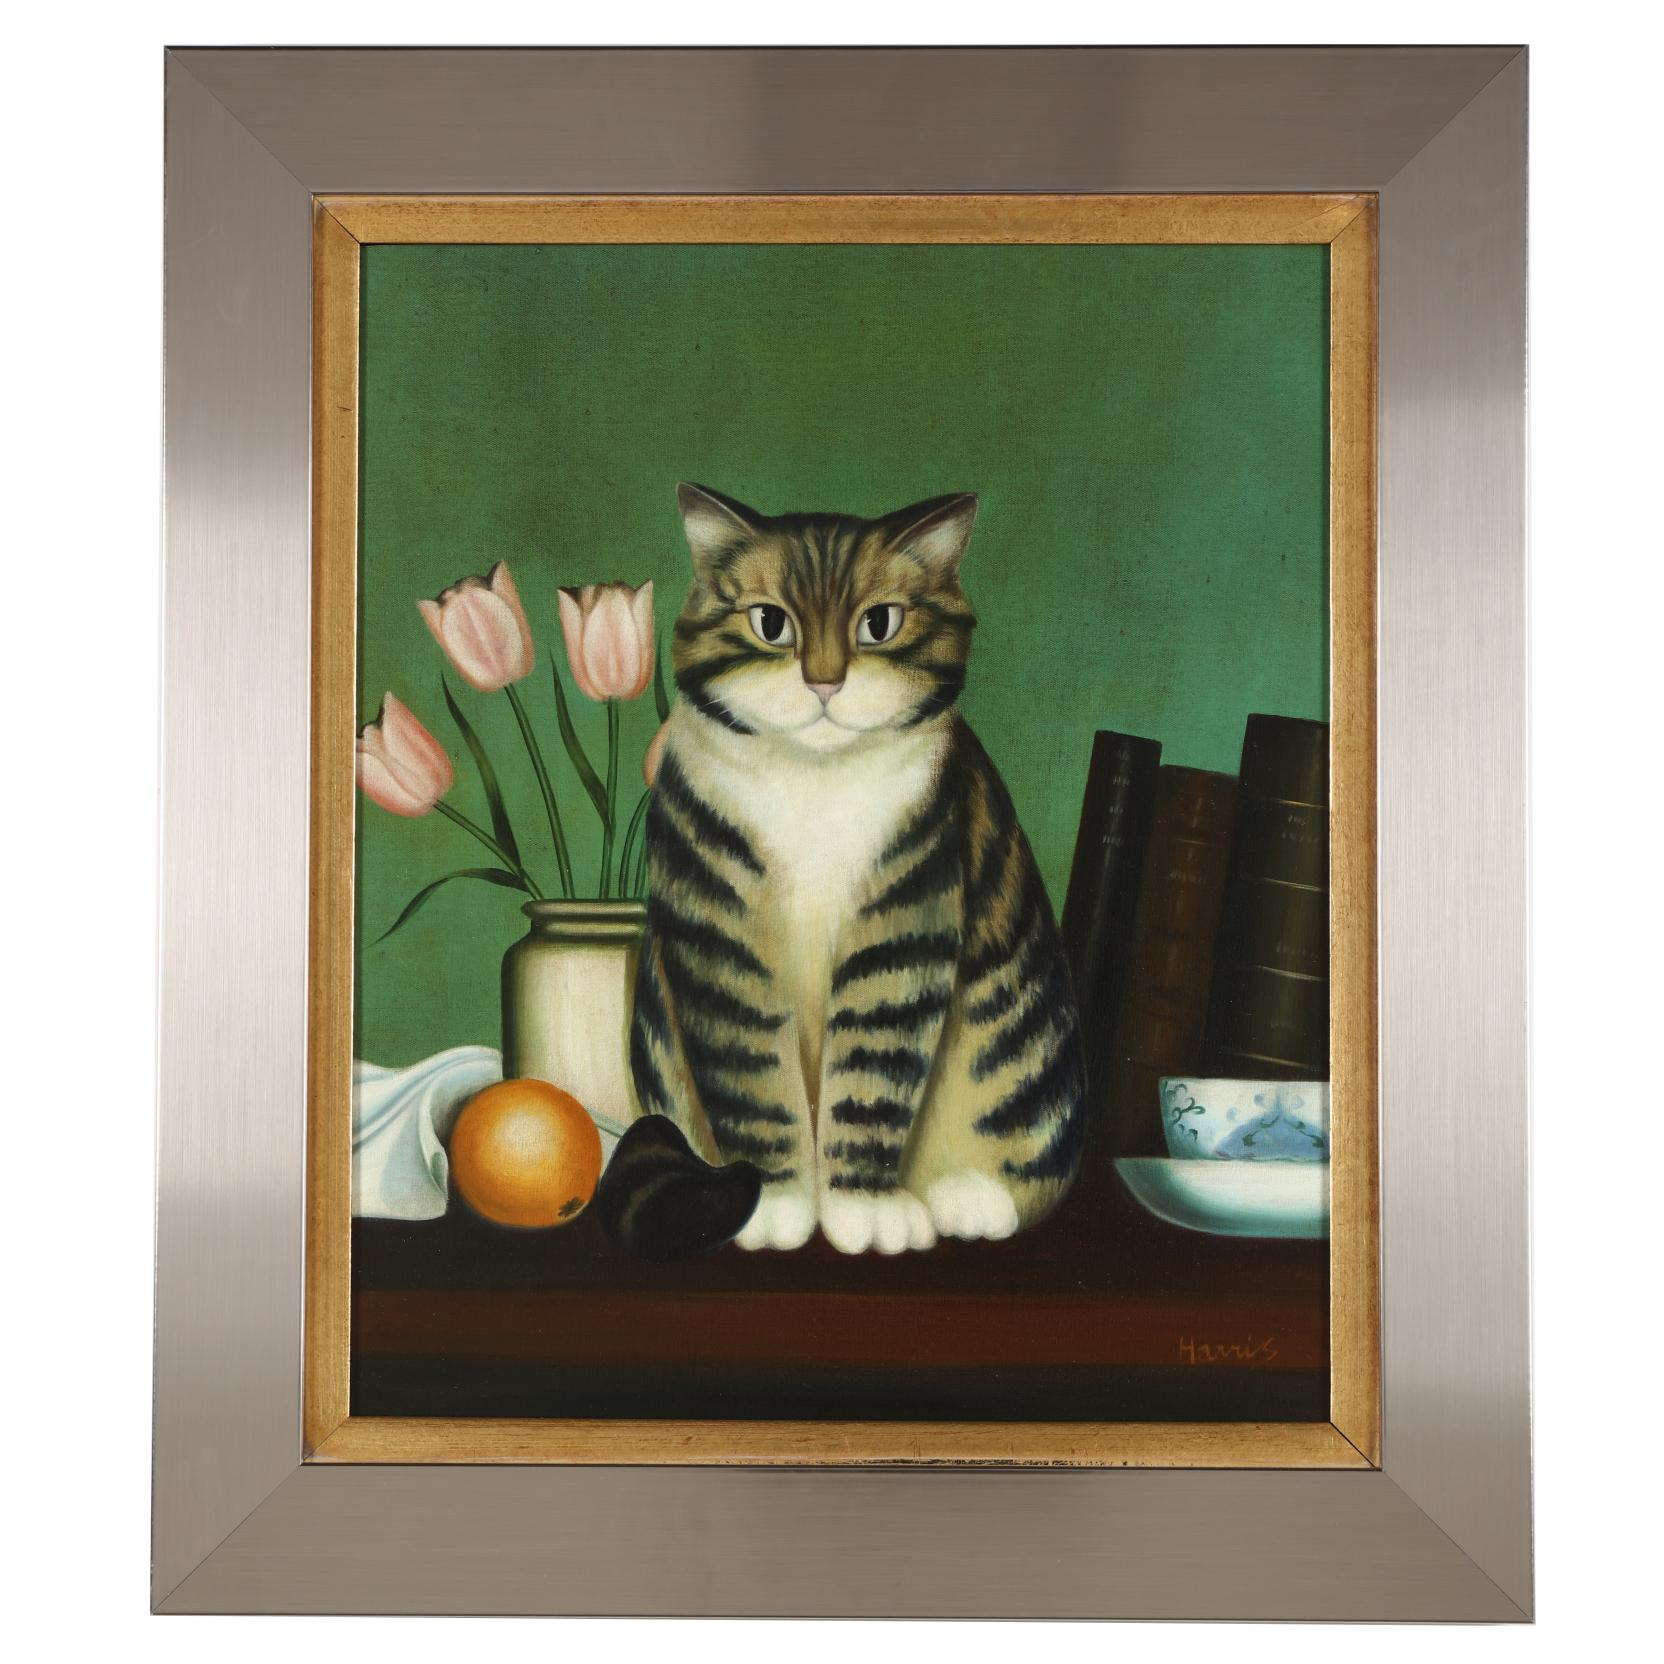 framed-portrait-of-a-tabby-cat